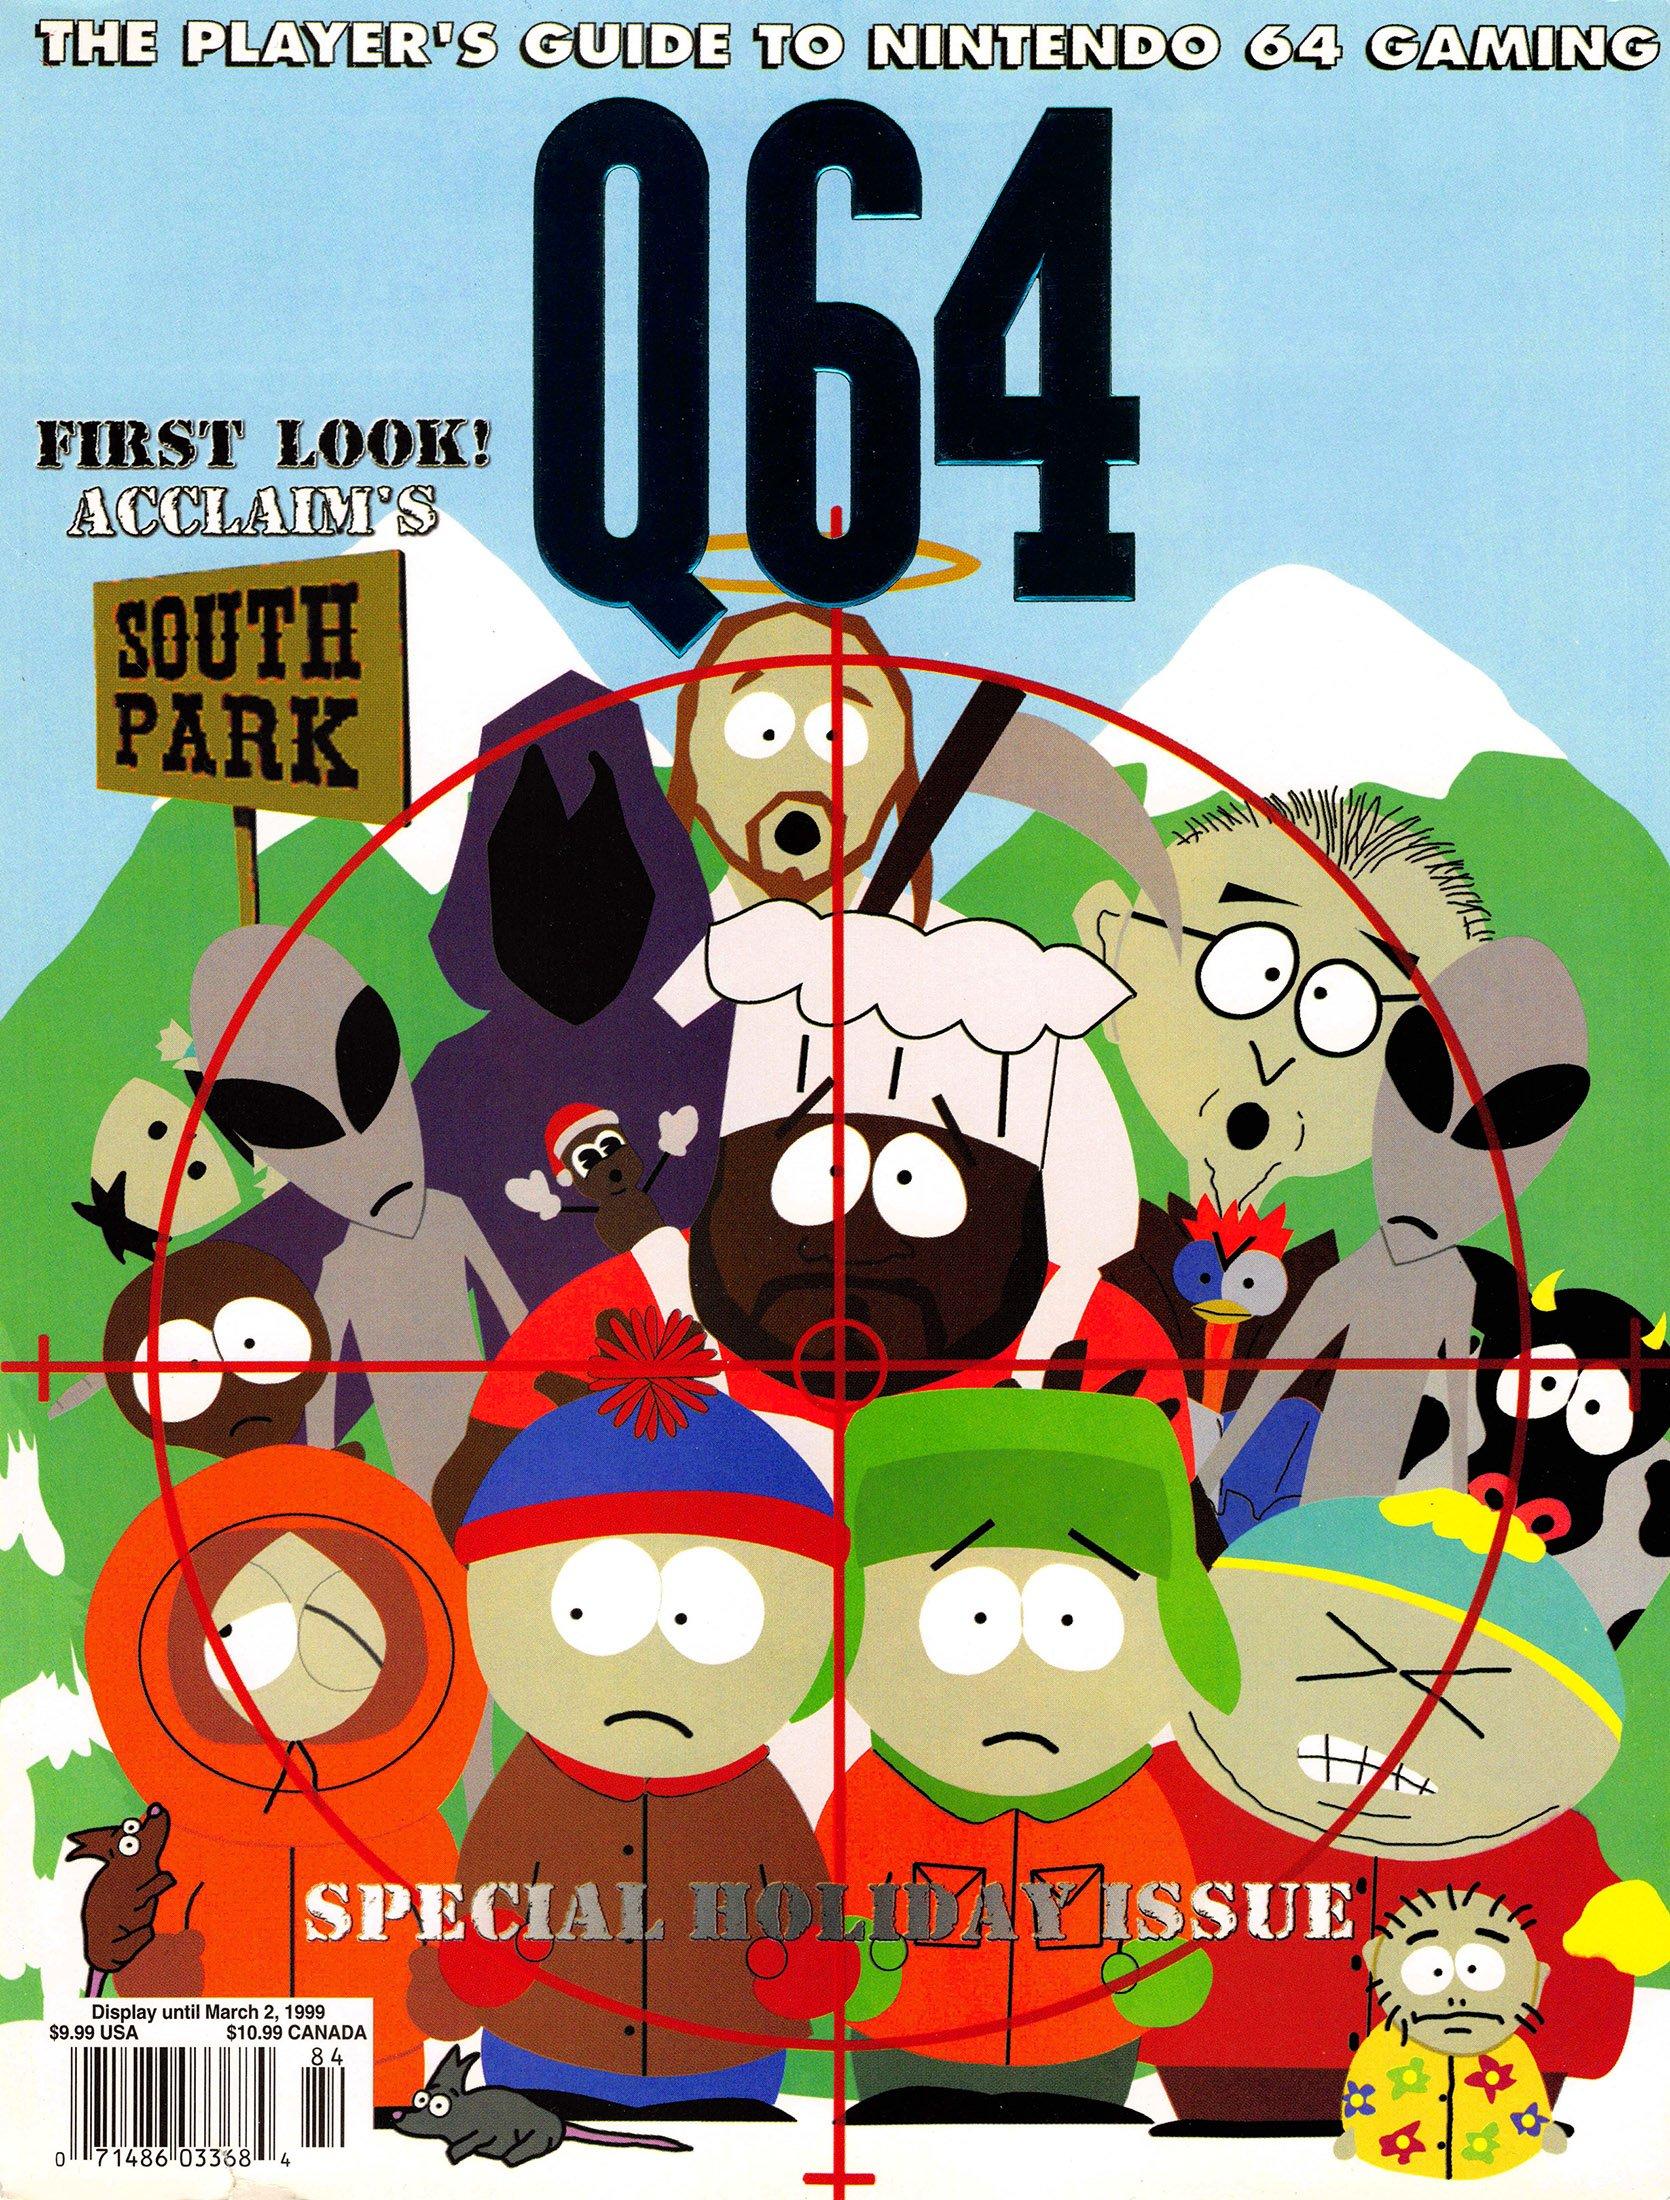 Q64 1999 Volume 1 (Winter)